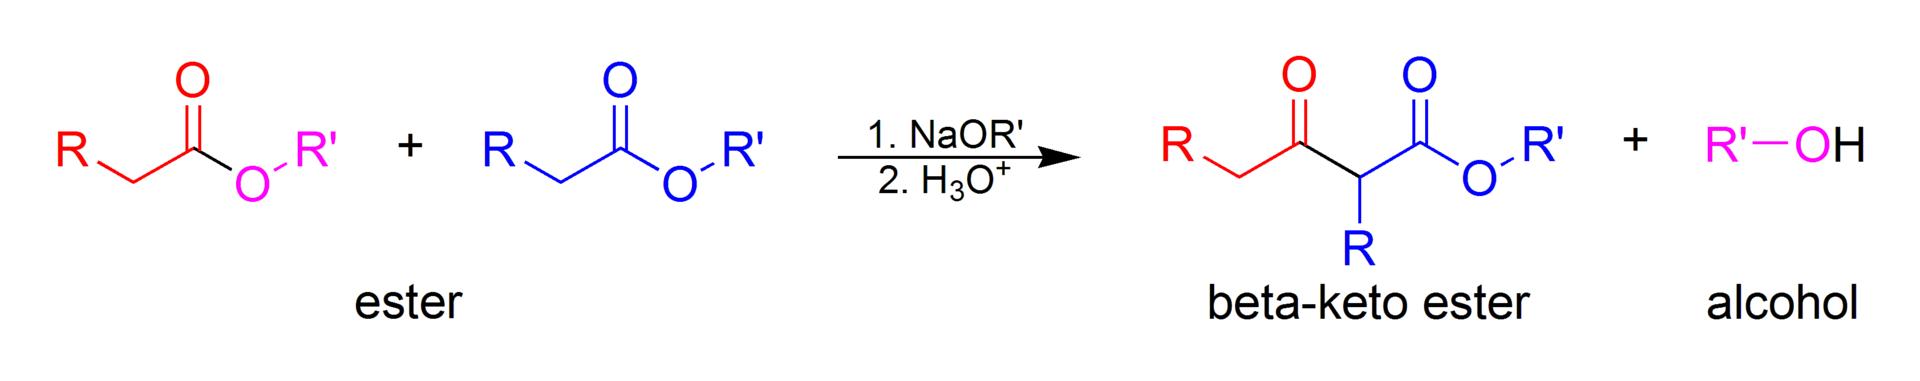 Difference Between Aldol Condensation and Claisen Condensation